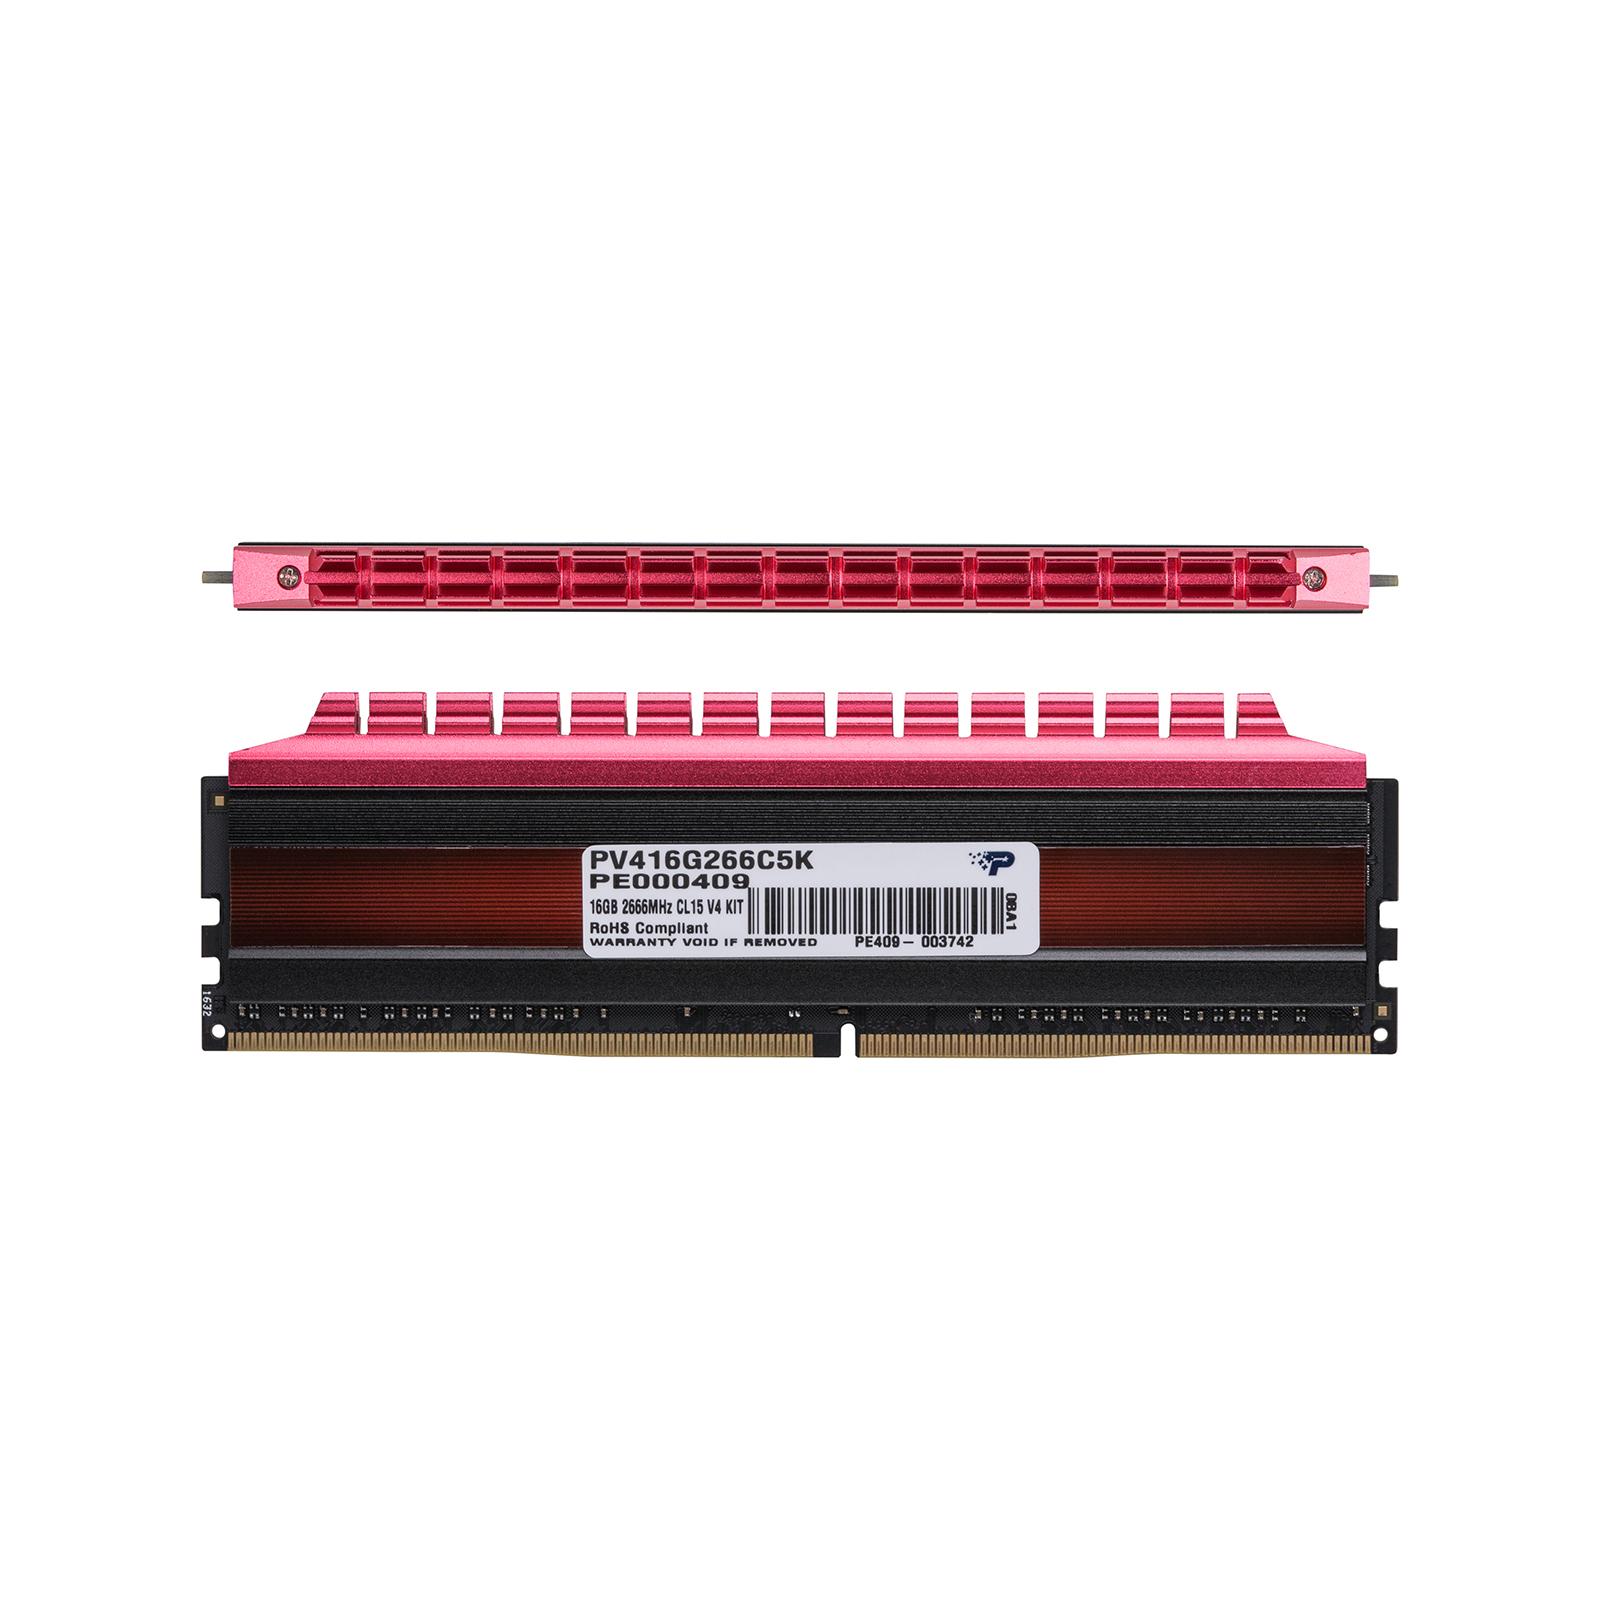 Модуль памяти для компьютера DDR4 16GB (2x8GB) 2666 MHz PE-V4 BLK/RED DUALCH Patriot (PV416G266C5K) изображение 2